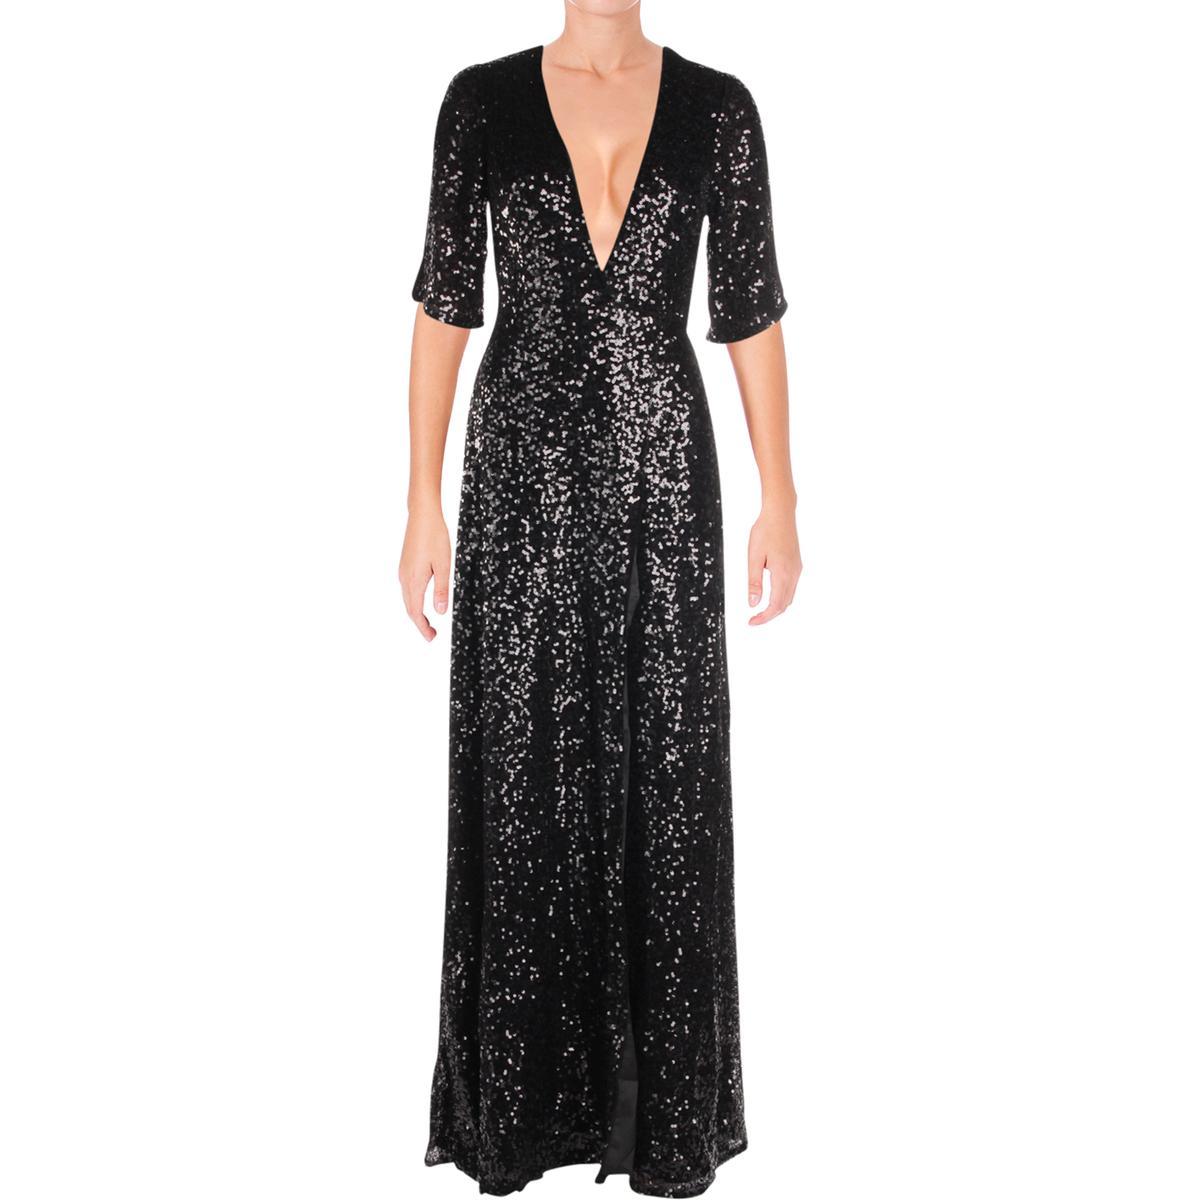 d36fbf89c8cd0 Details about Aidan by Aidan Mattox Womens Formal Black Tie Evening Dress  Gown BHFO 6078